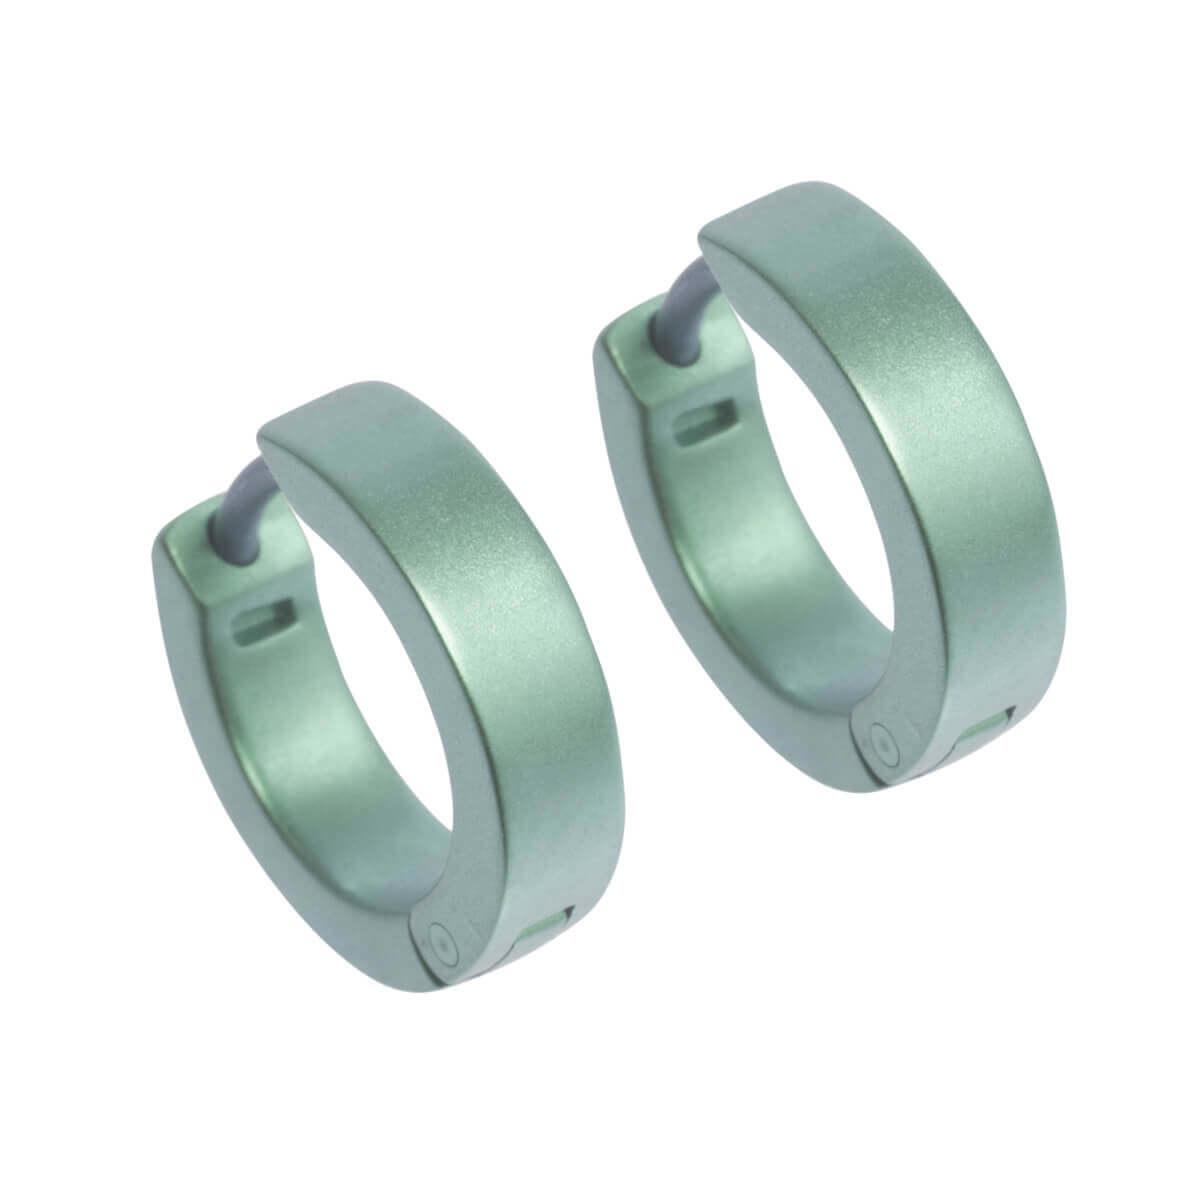 Naisz Titanium Design Earring 12mm x 4mm  2017326-40